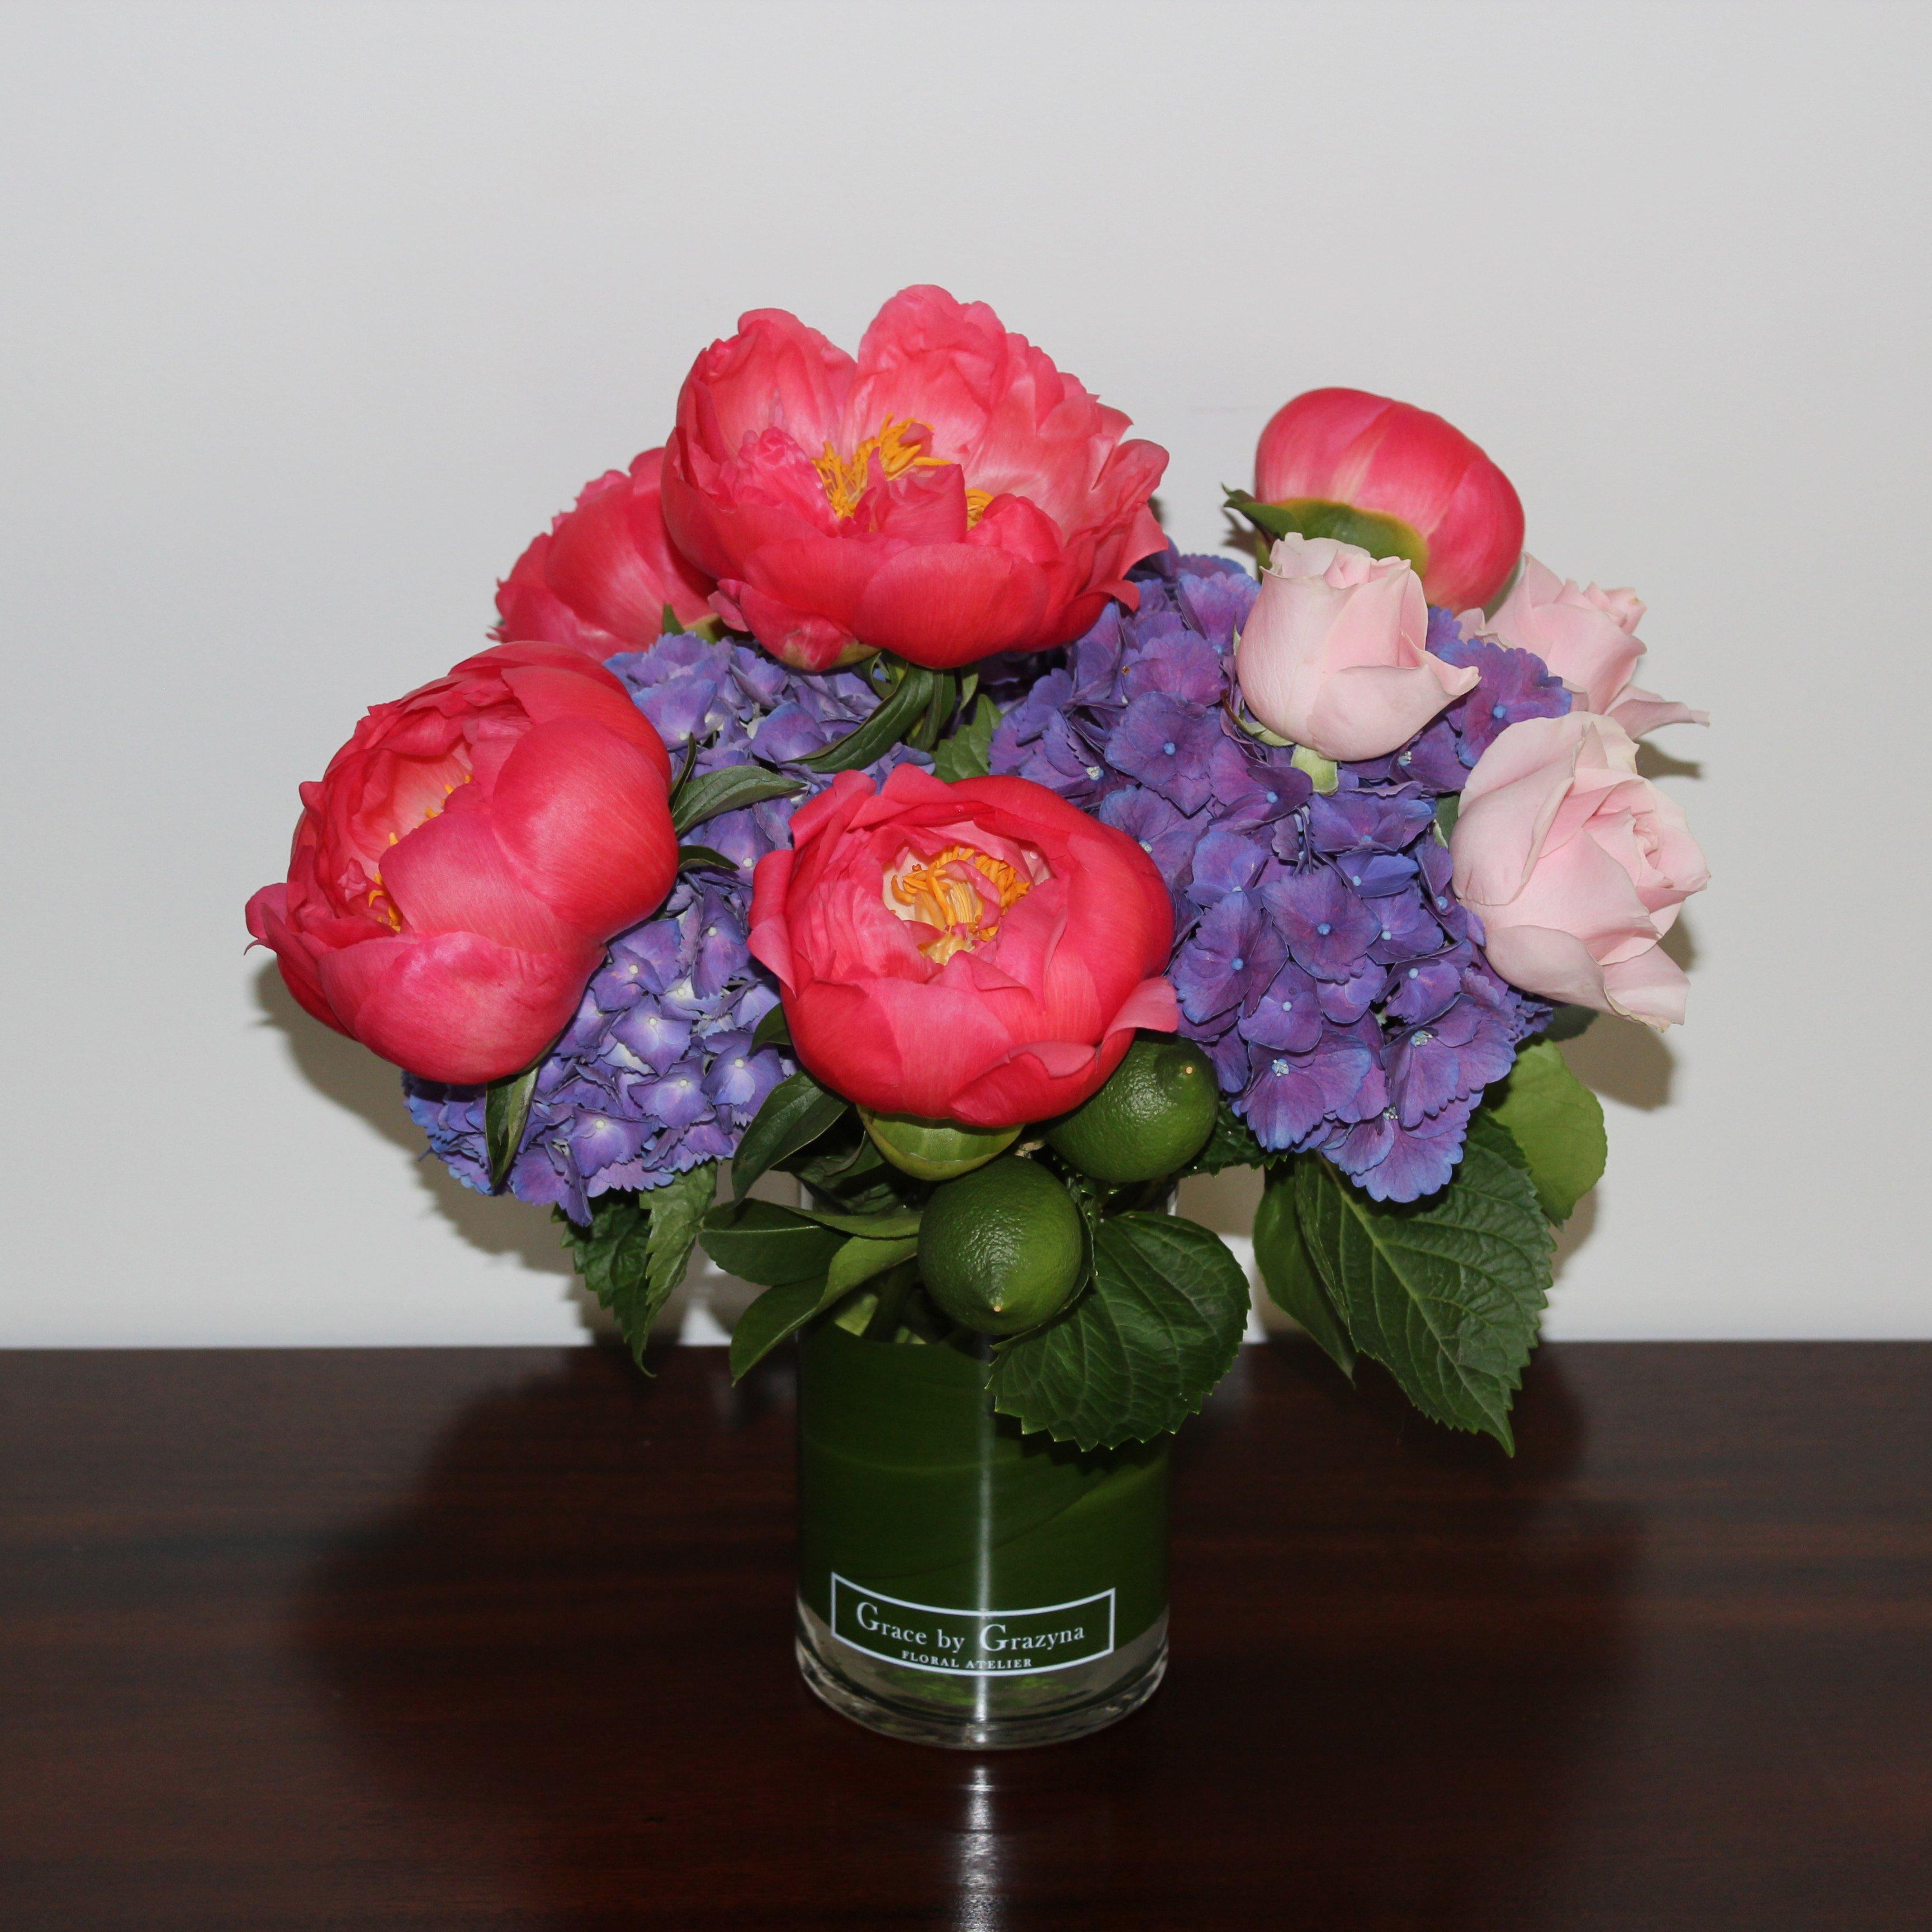 Luxury flower bouquets brisbane component wedding and flowers flower bouquets brisbane images flower wallpaper hd izmirmasajfo